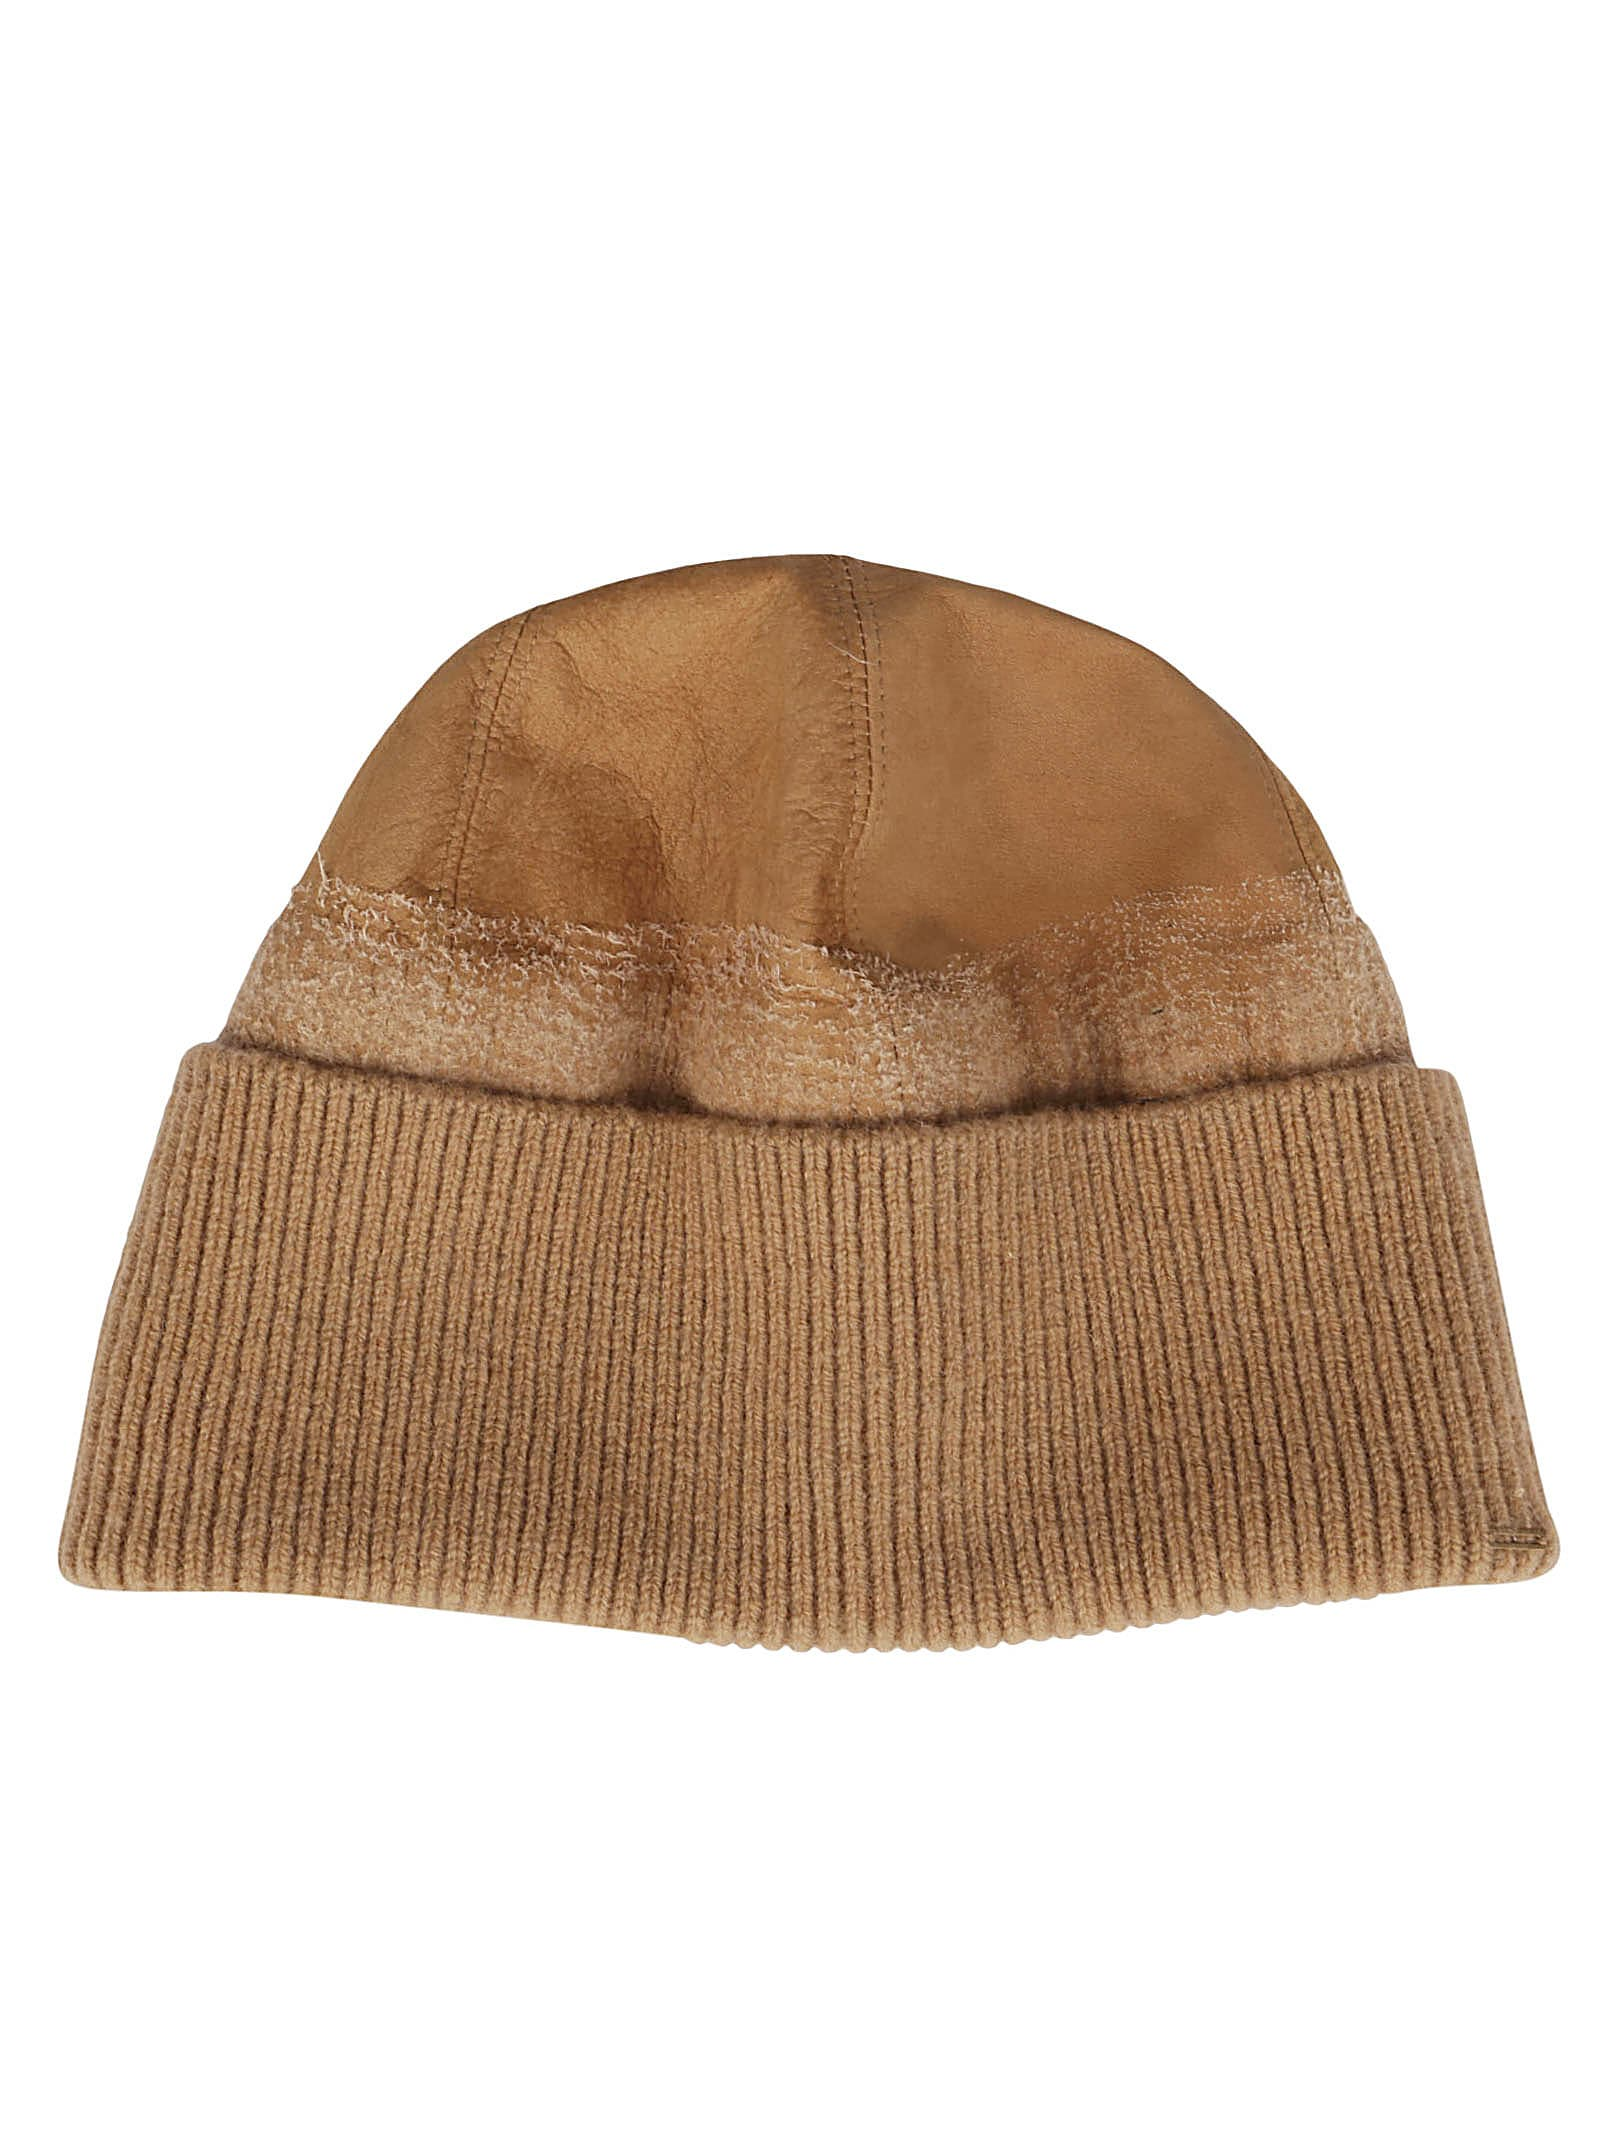 CA4LA Brown Leather Hat